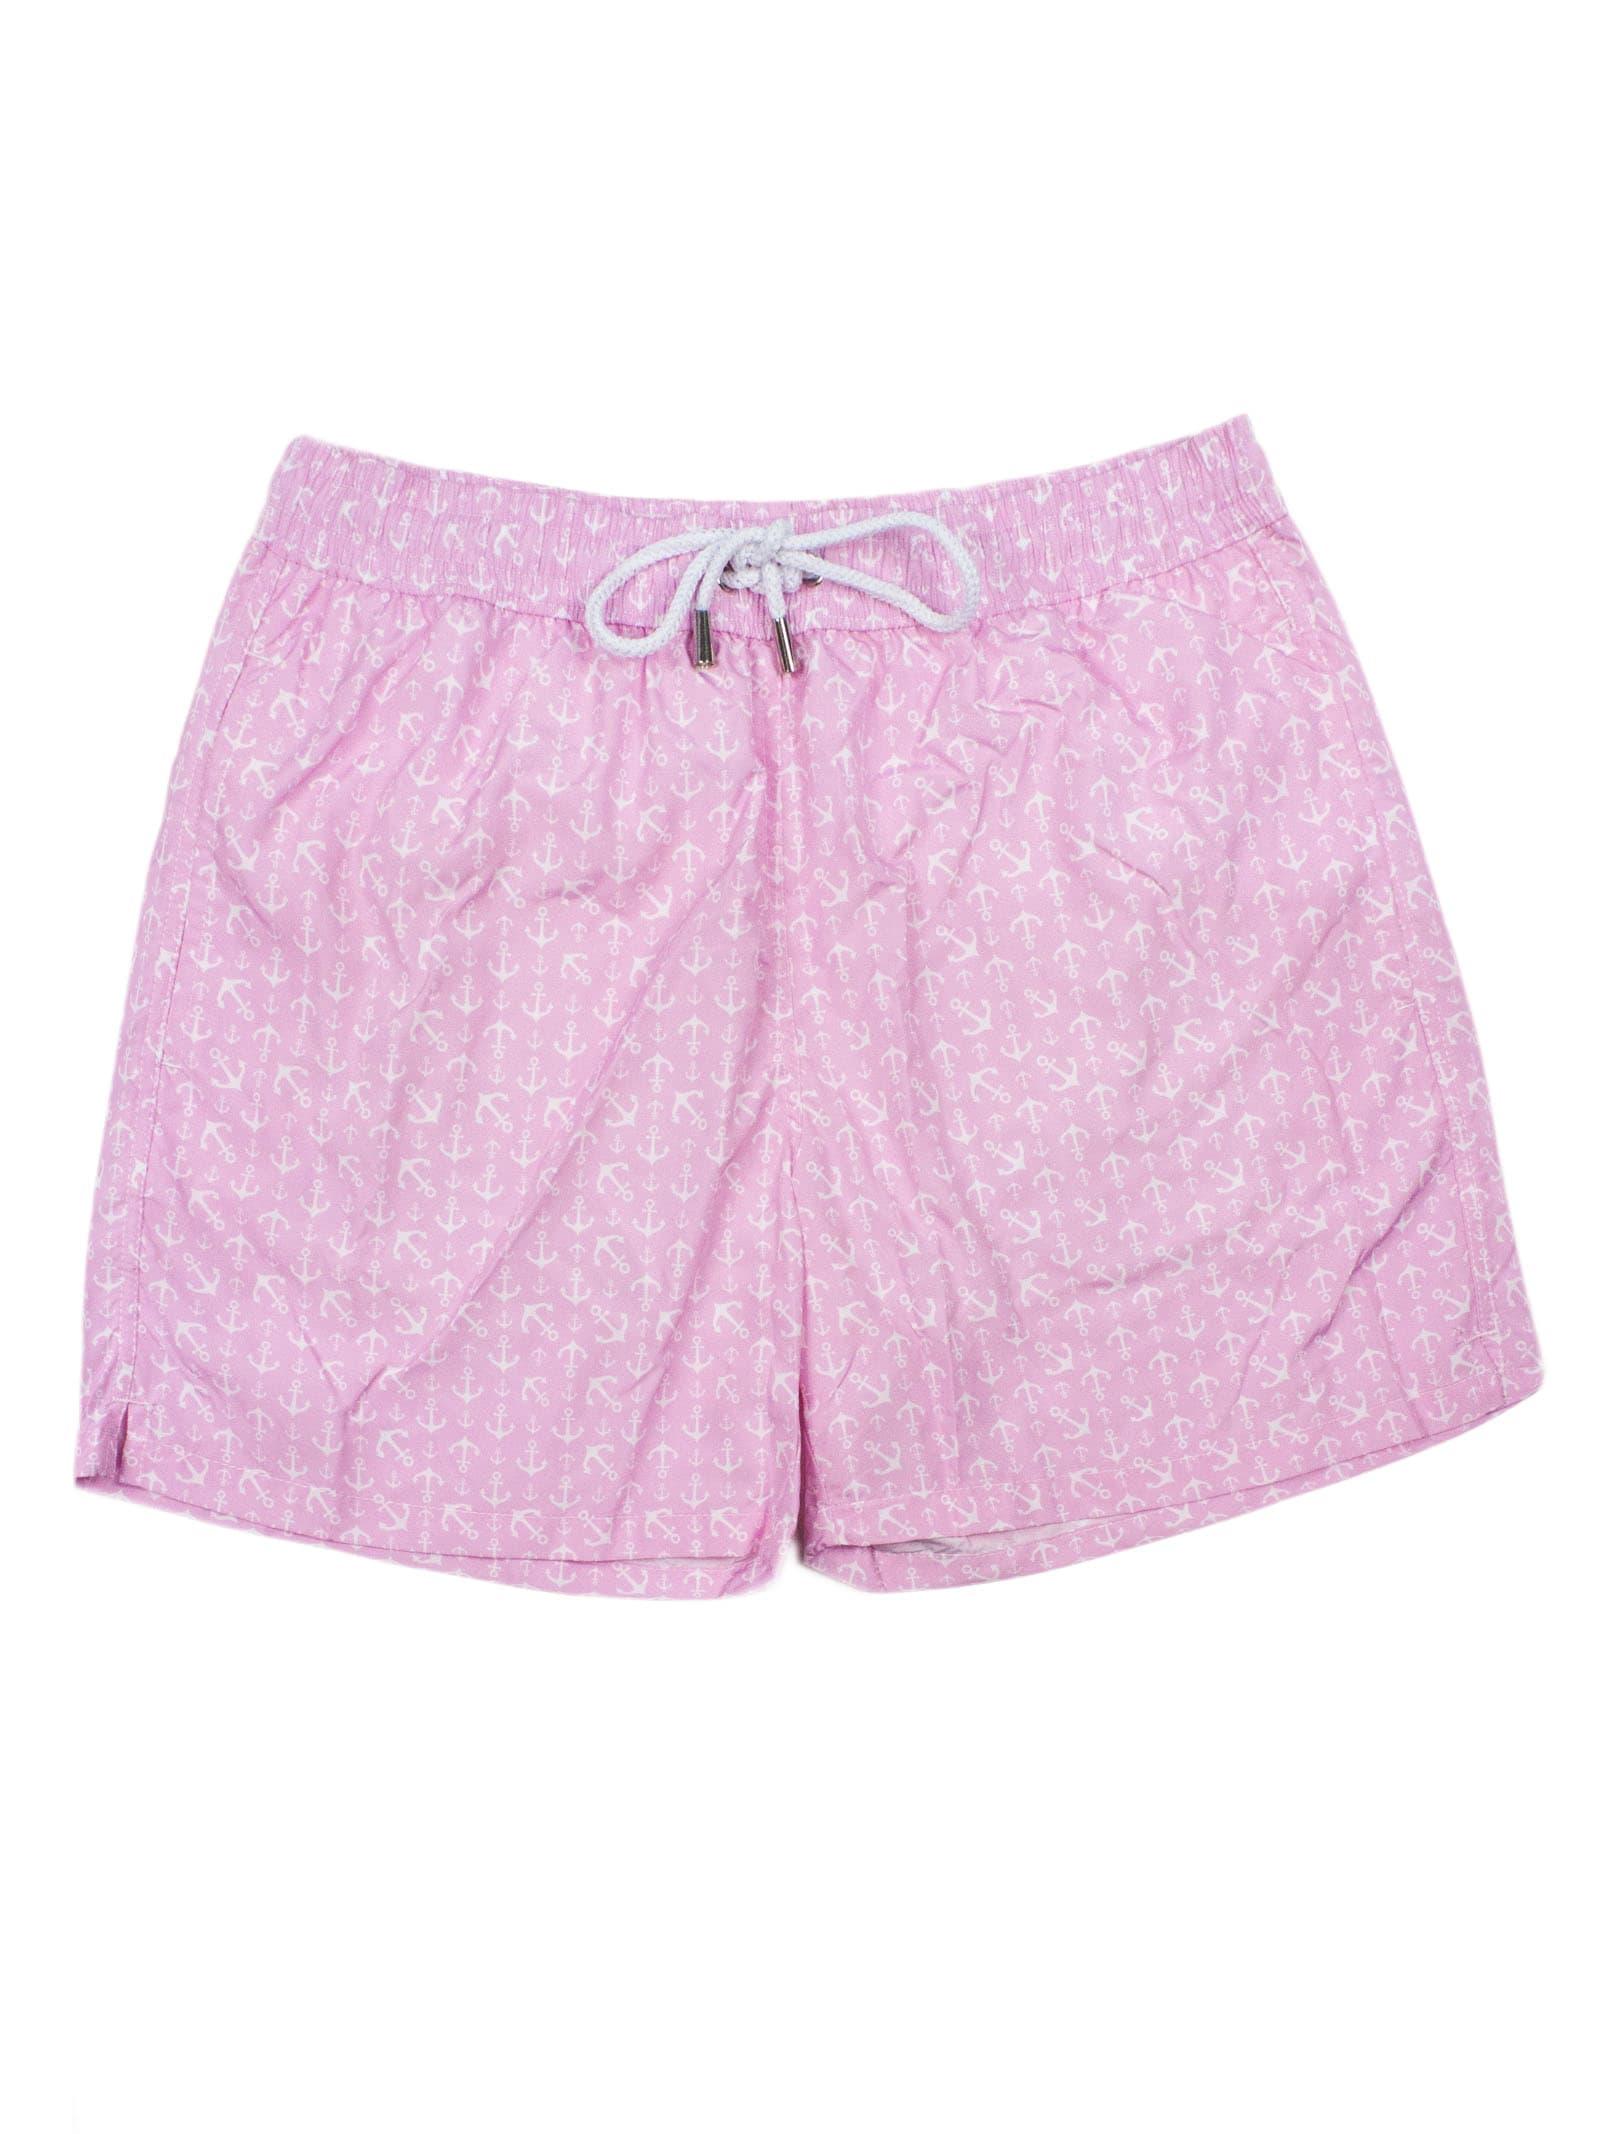 Pink Swim Trunks